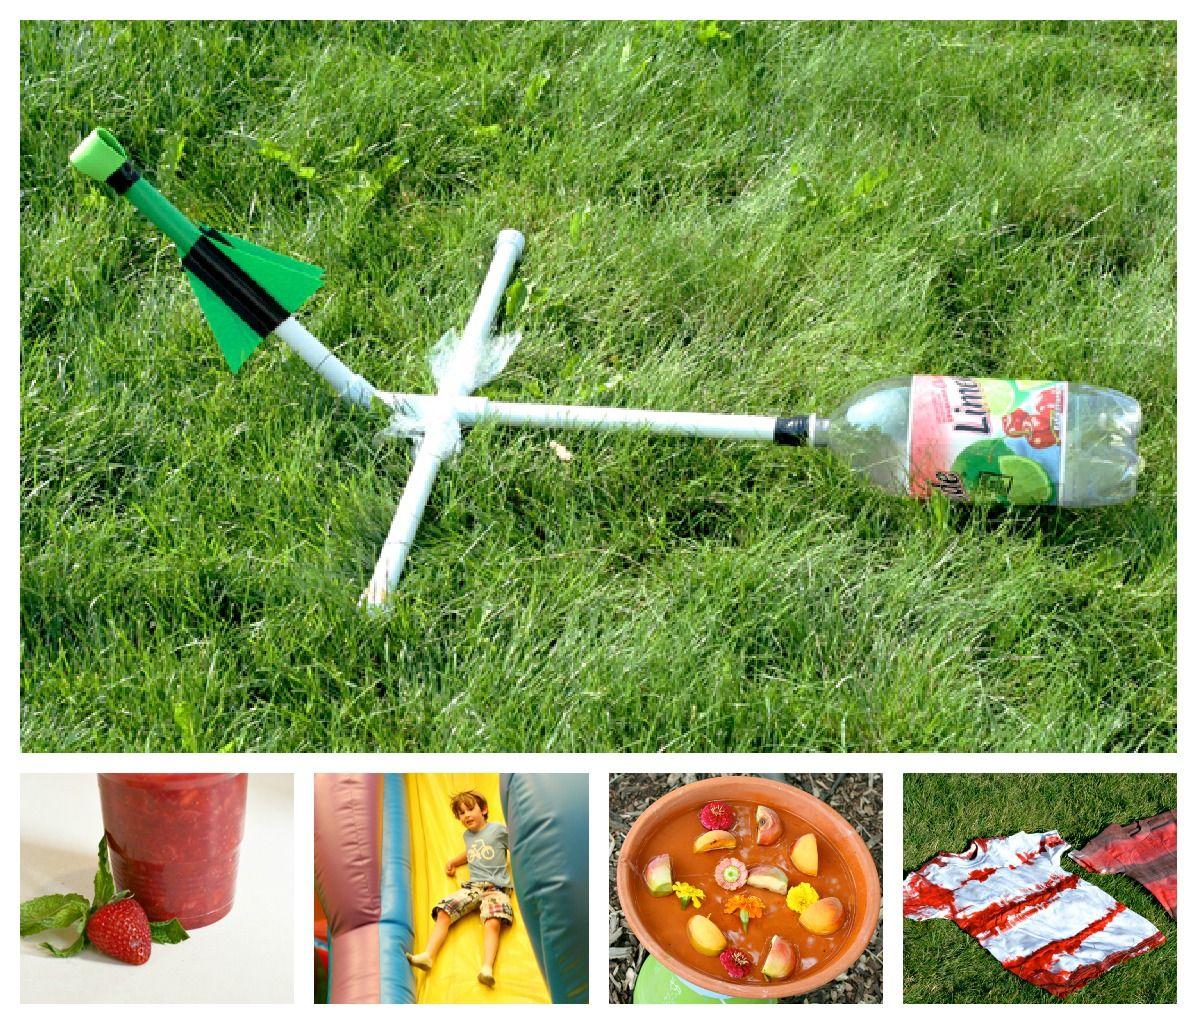 Water Bottle Rocket Craft: Craft, Interrupted: Fun Jar Friday #17: Bottle Rocket